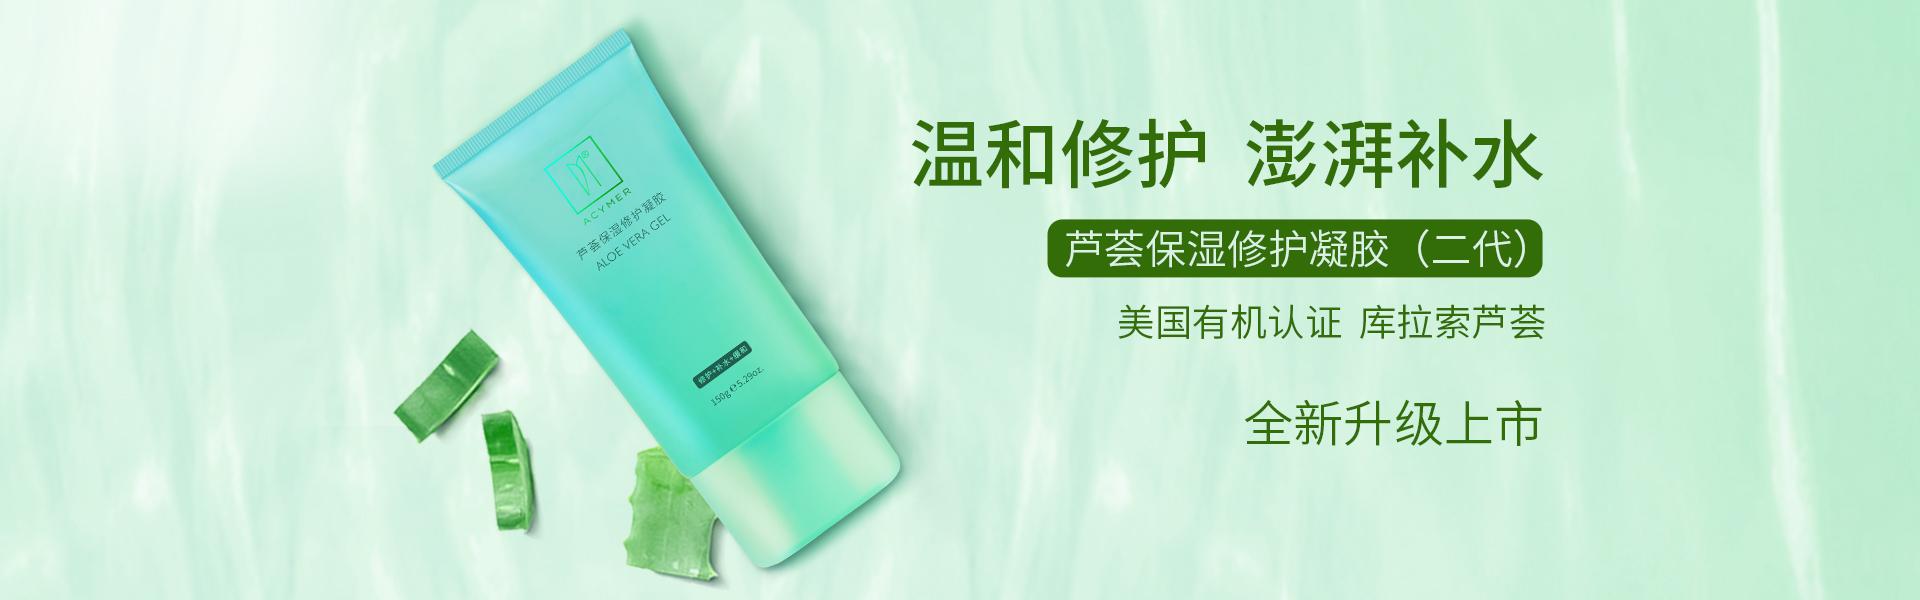 AC36 芦荟保湿修护凝胶(二代)150g